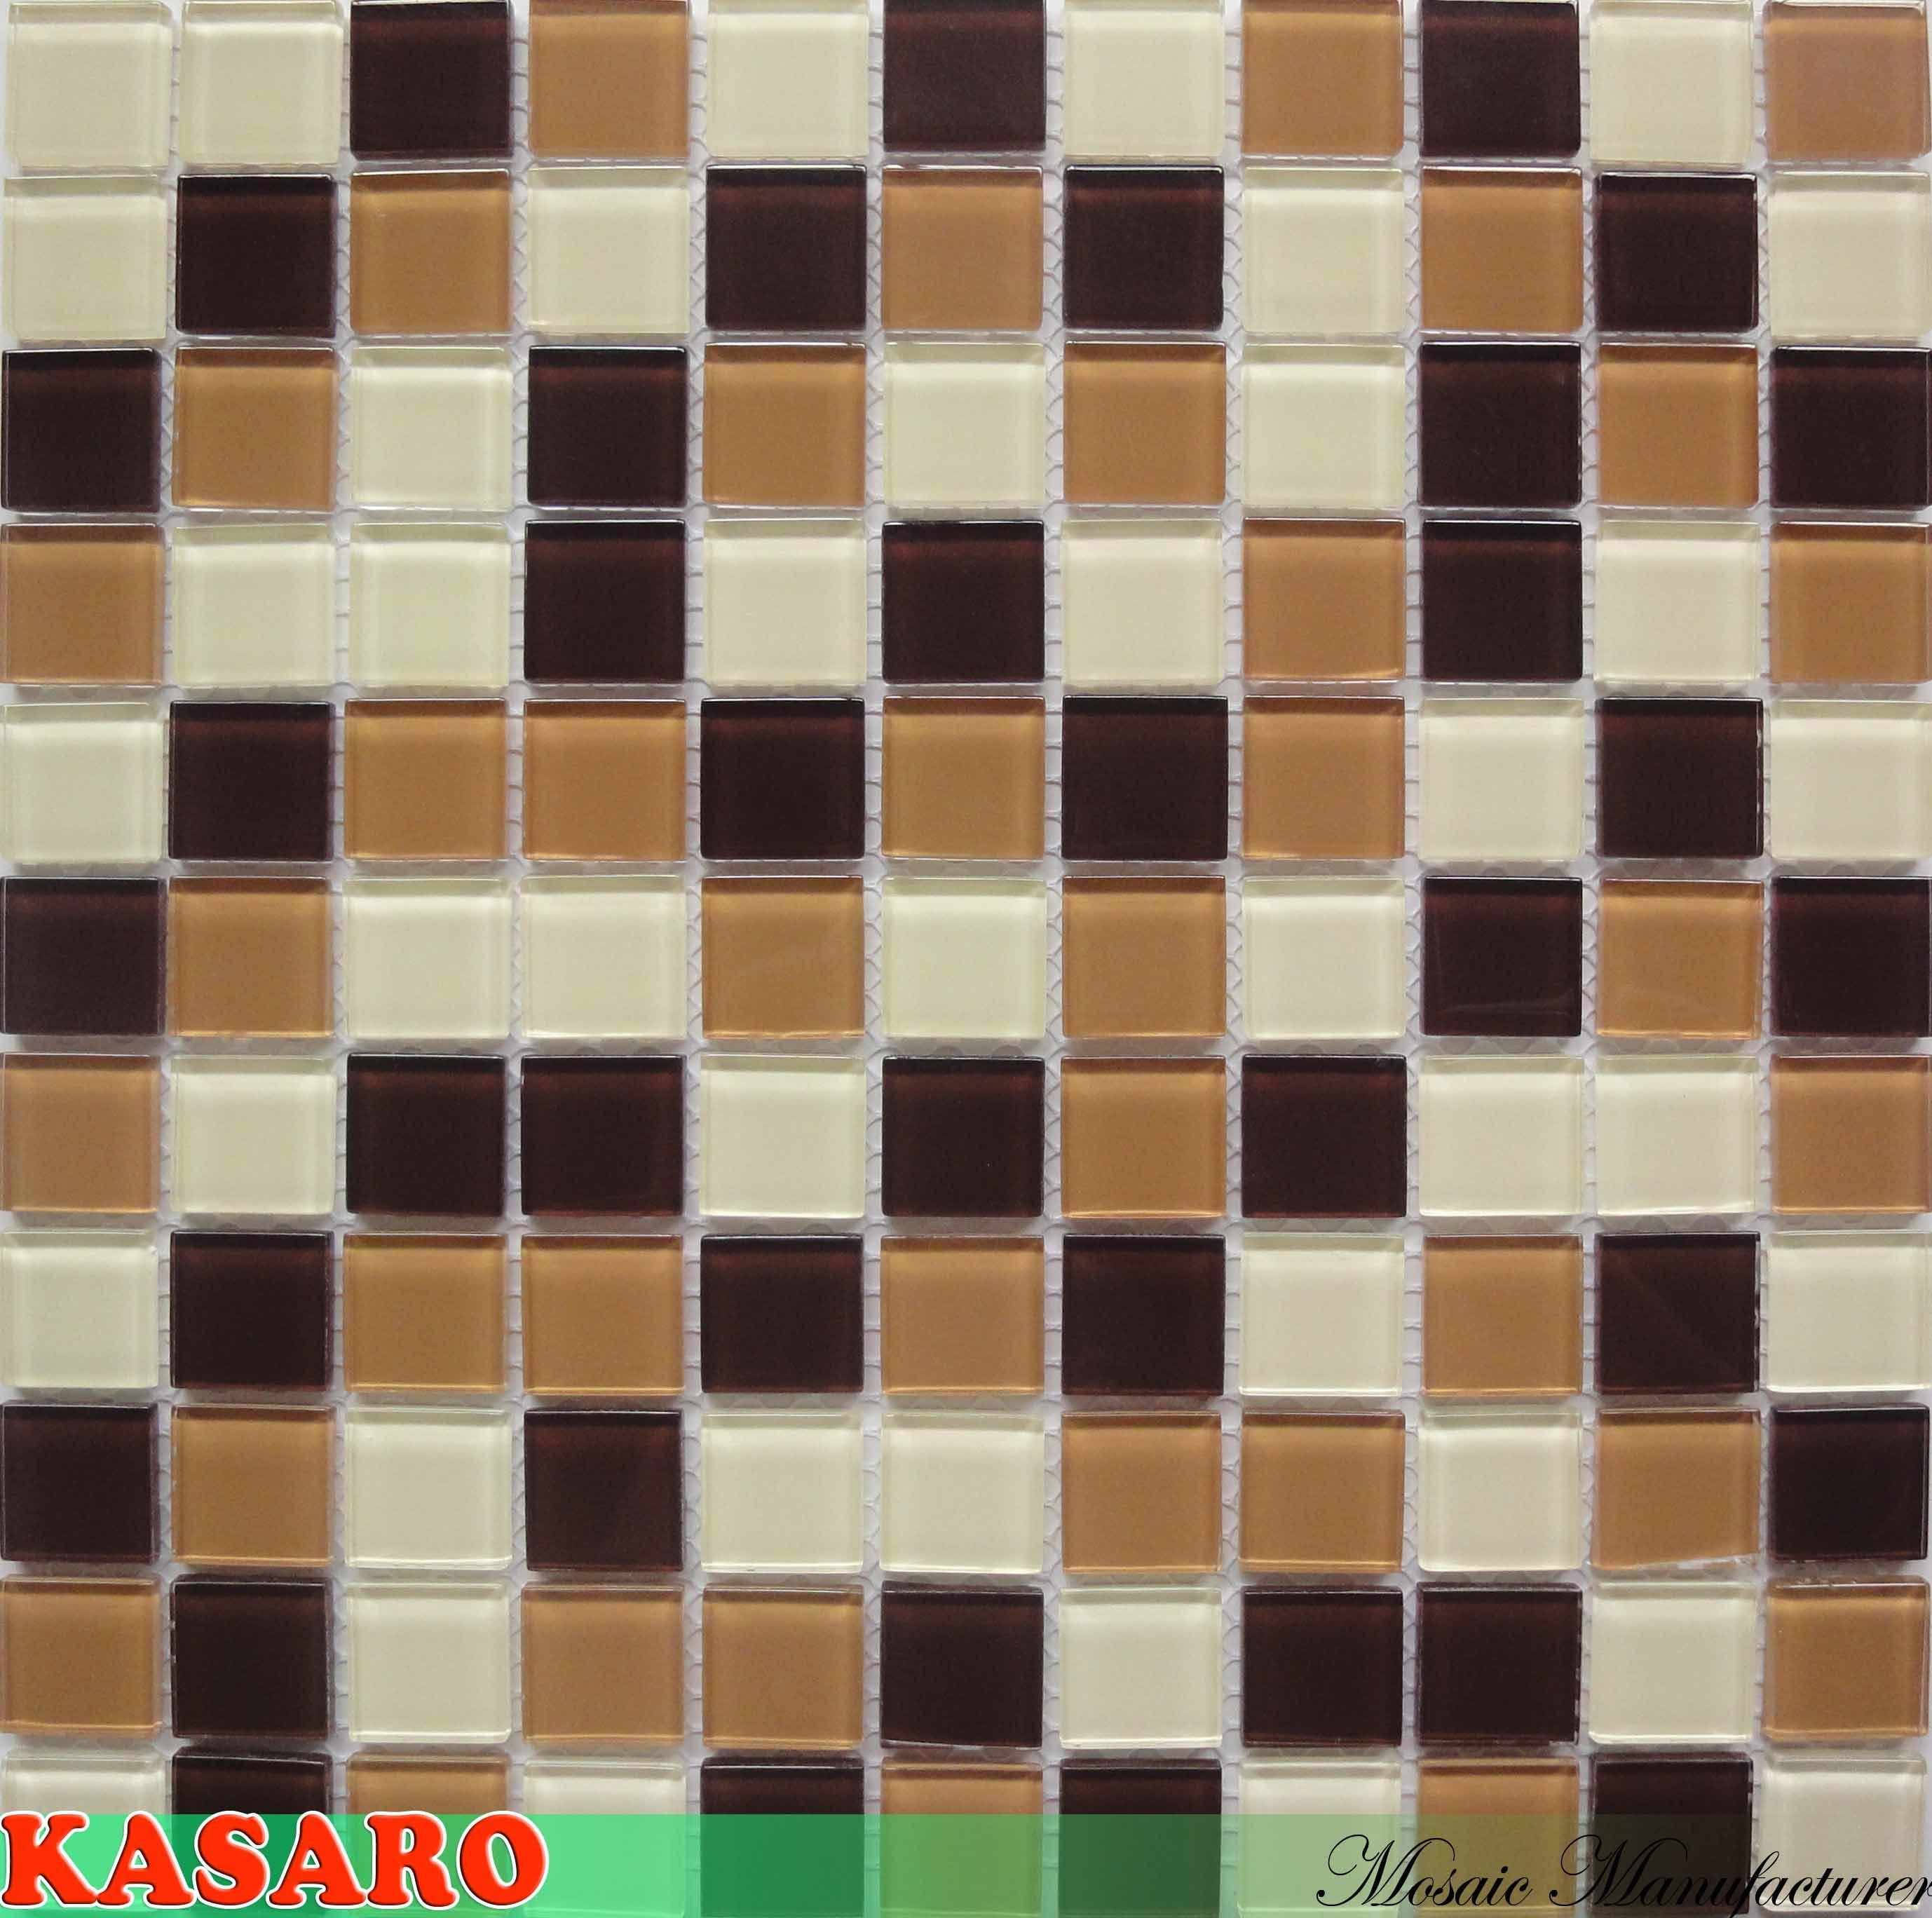 zhejiang kasaro new decorative material co ltd